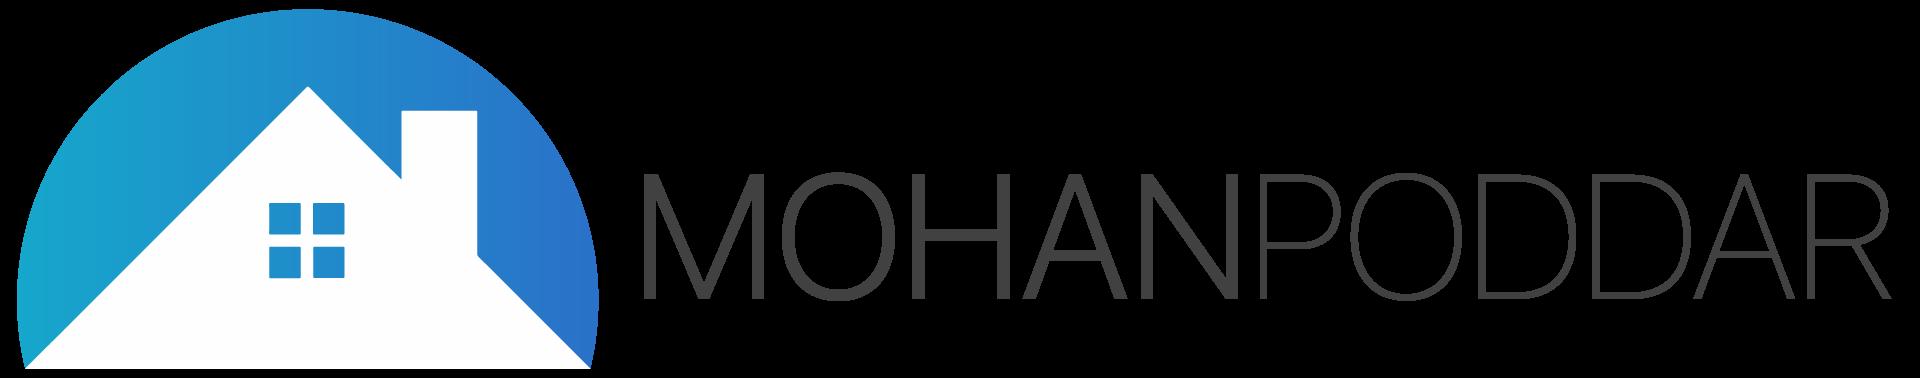 Mohan Poddar